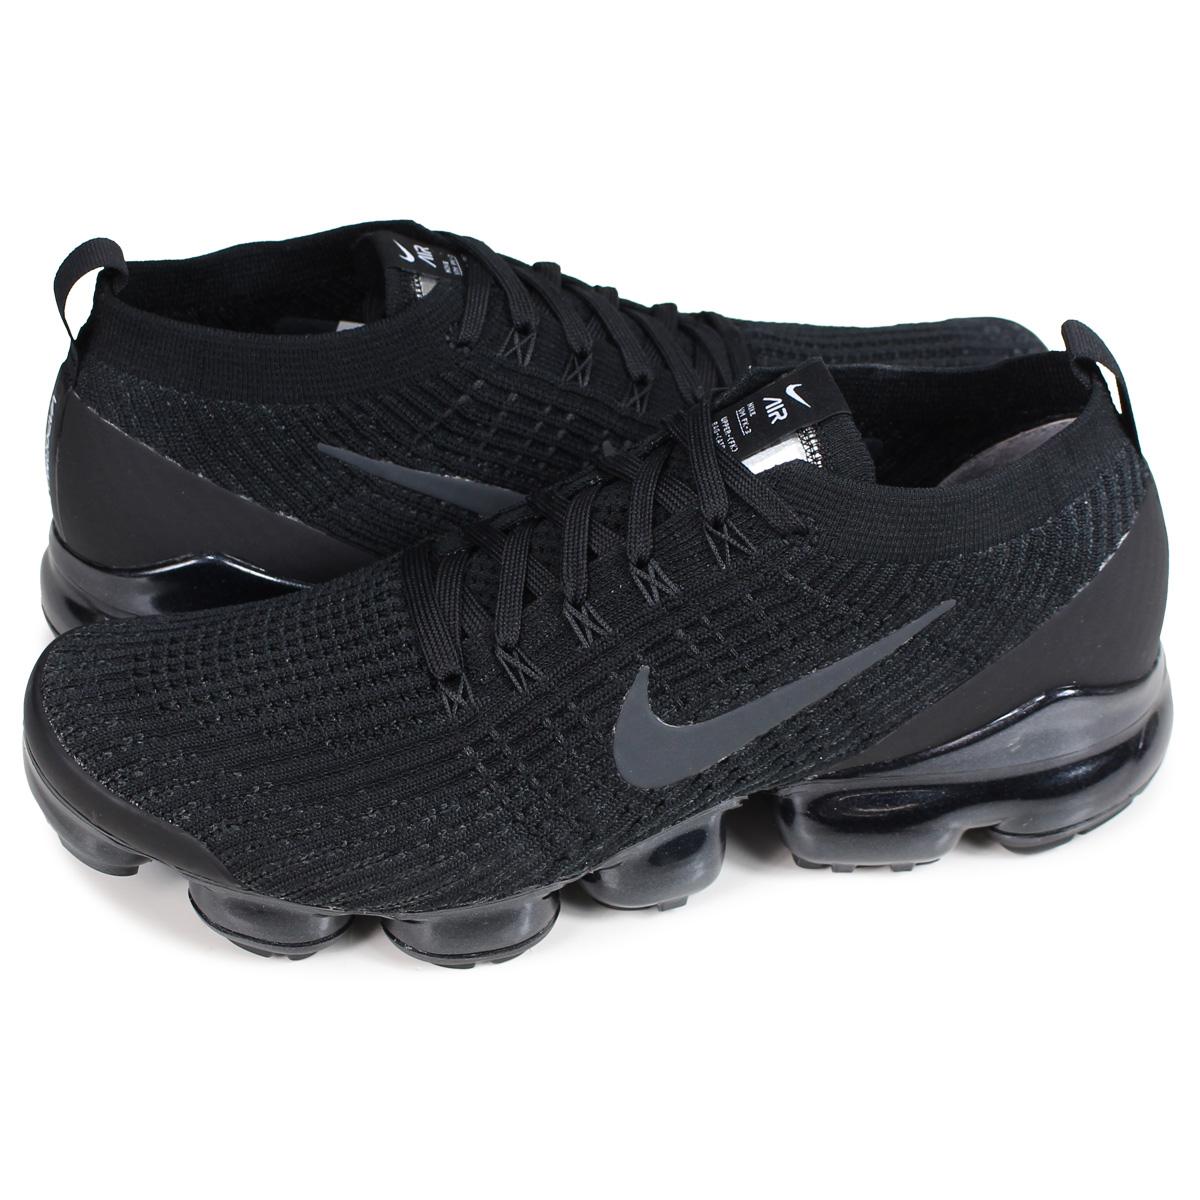 Nike NIKE air vapor max fried food knit 3 sneakers men AIR VAPORMAX FLYKNIT 3 black black AJ6900 004